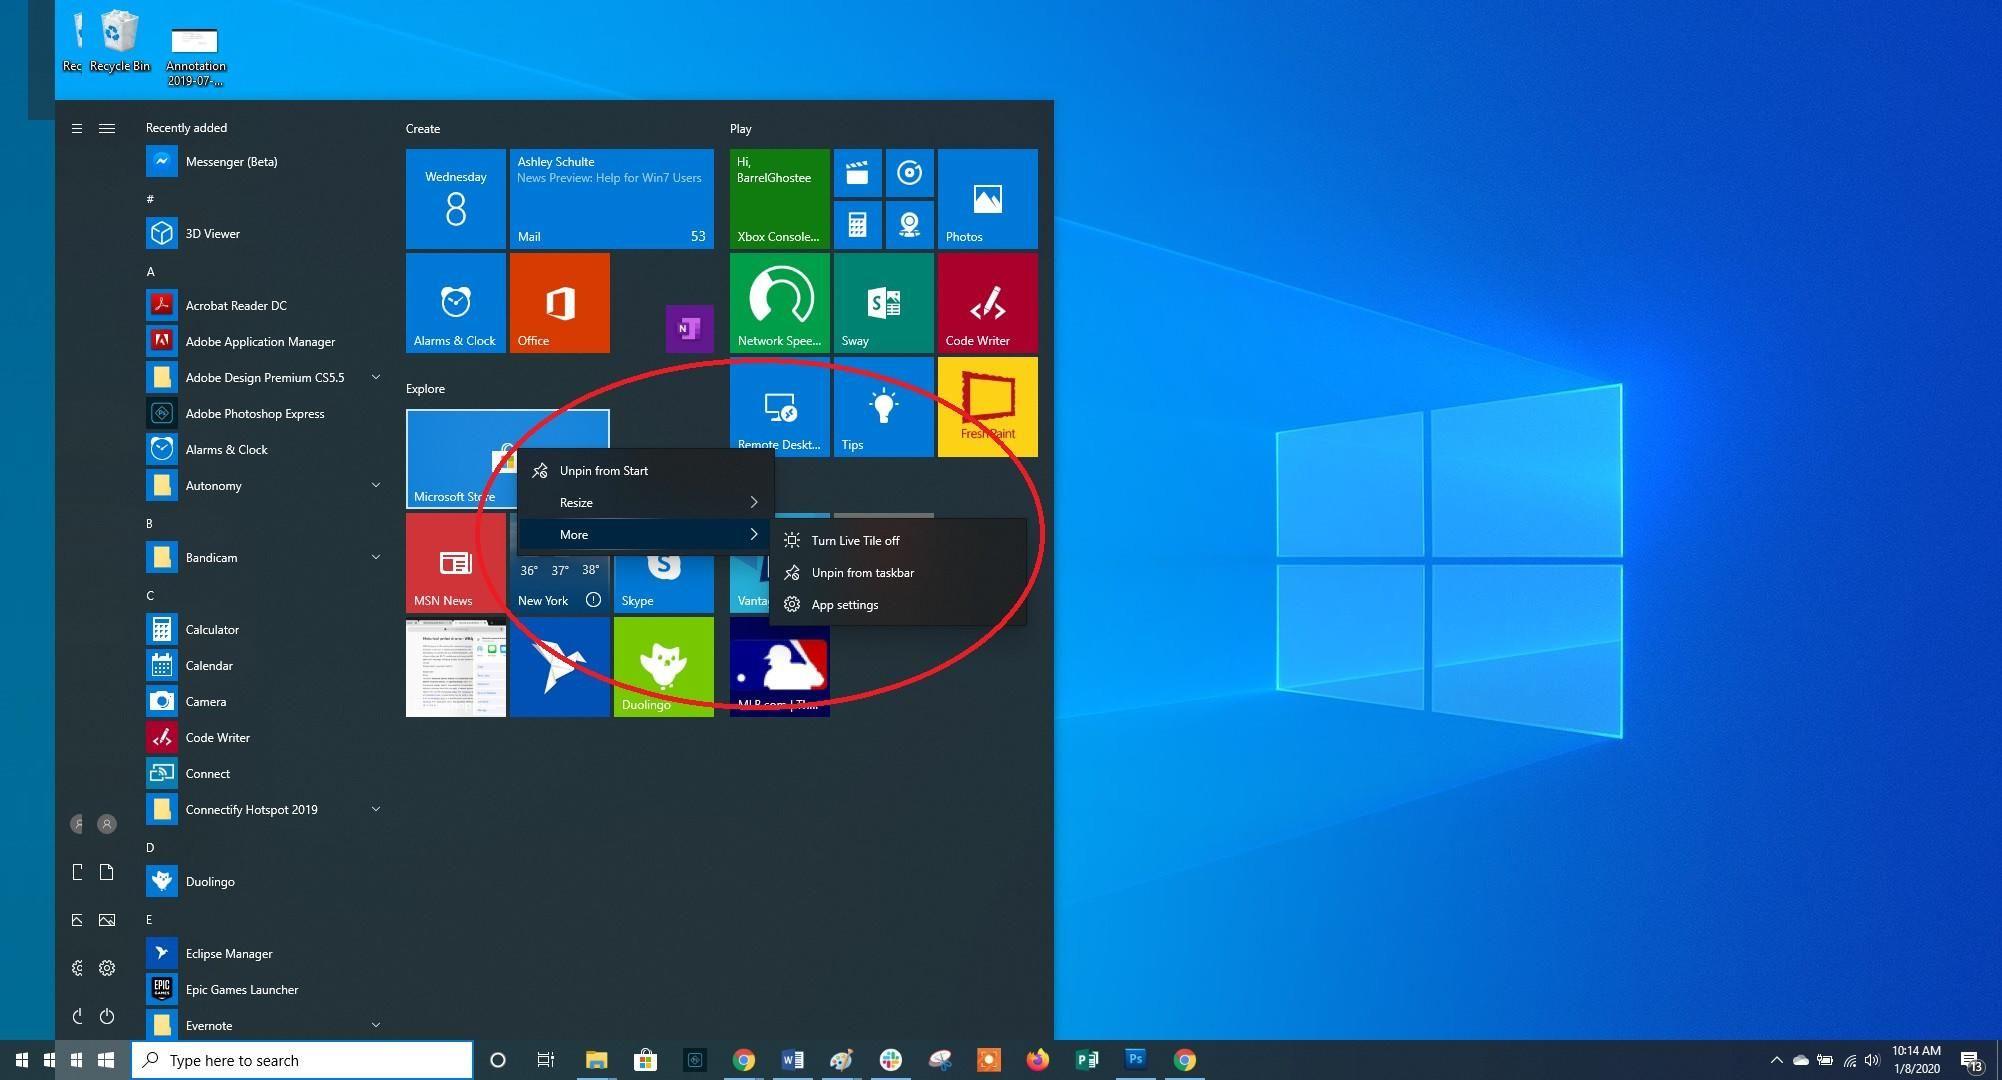 Hidden Tricks Inside Windows 10 In 2020 Windows 10 Windows Life Hacks Websites